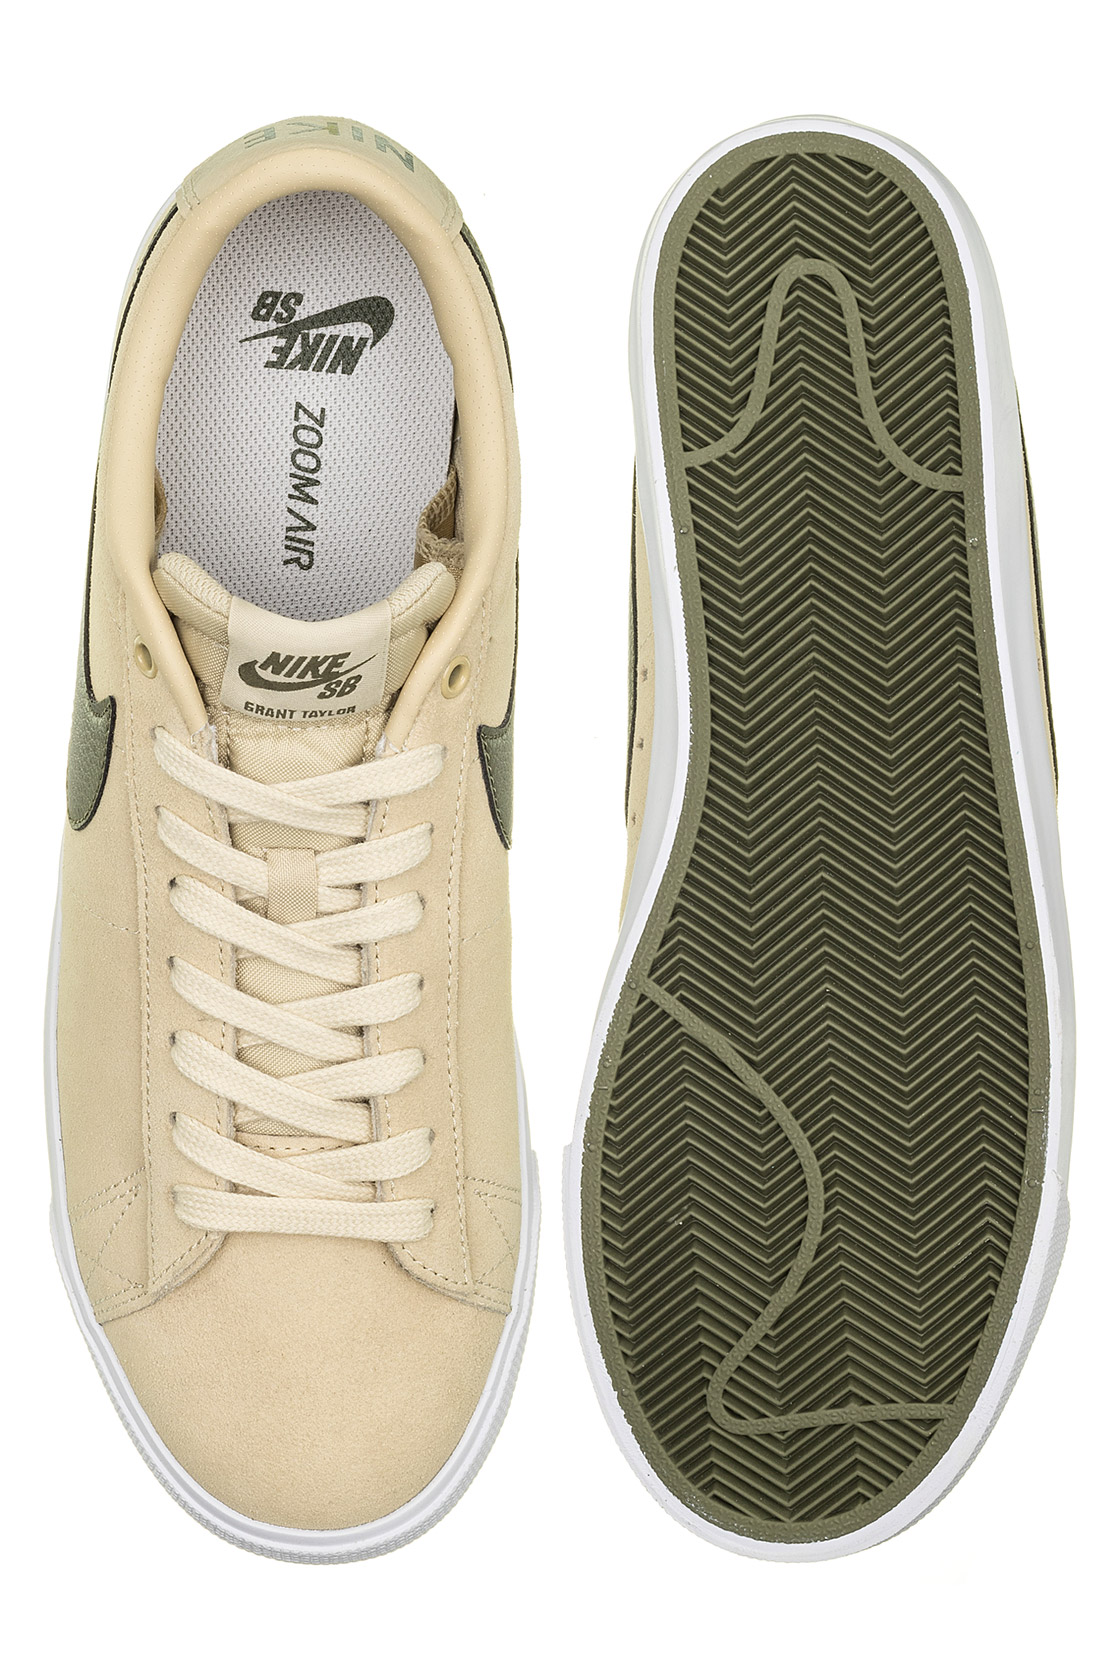 Blazer Chaussuredesert Nike Sb Ore Low Gt IeE9HWD2Y